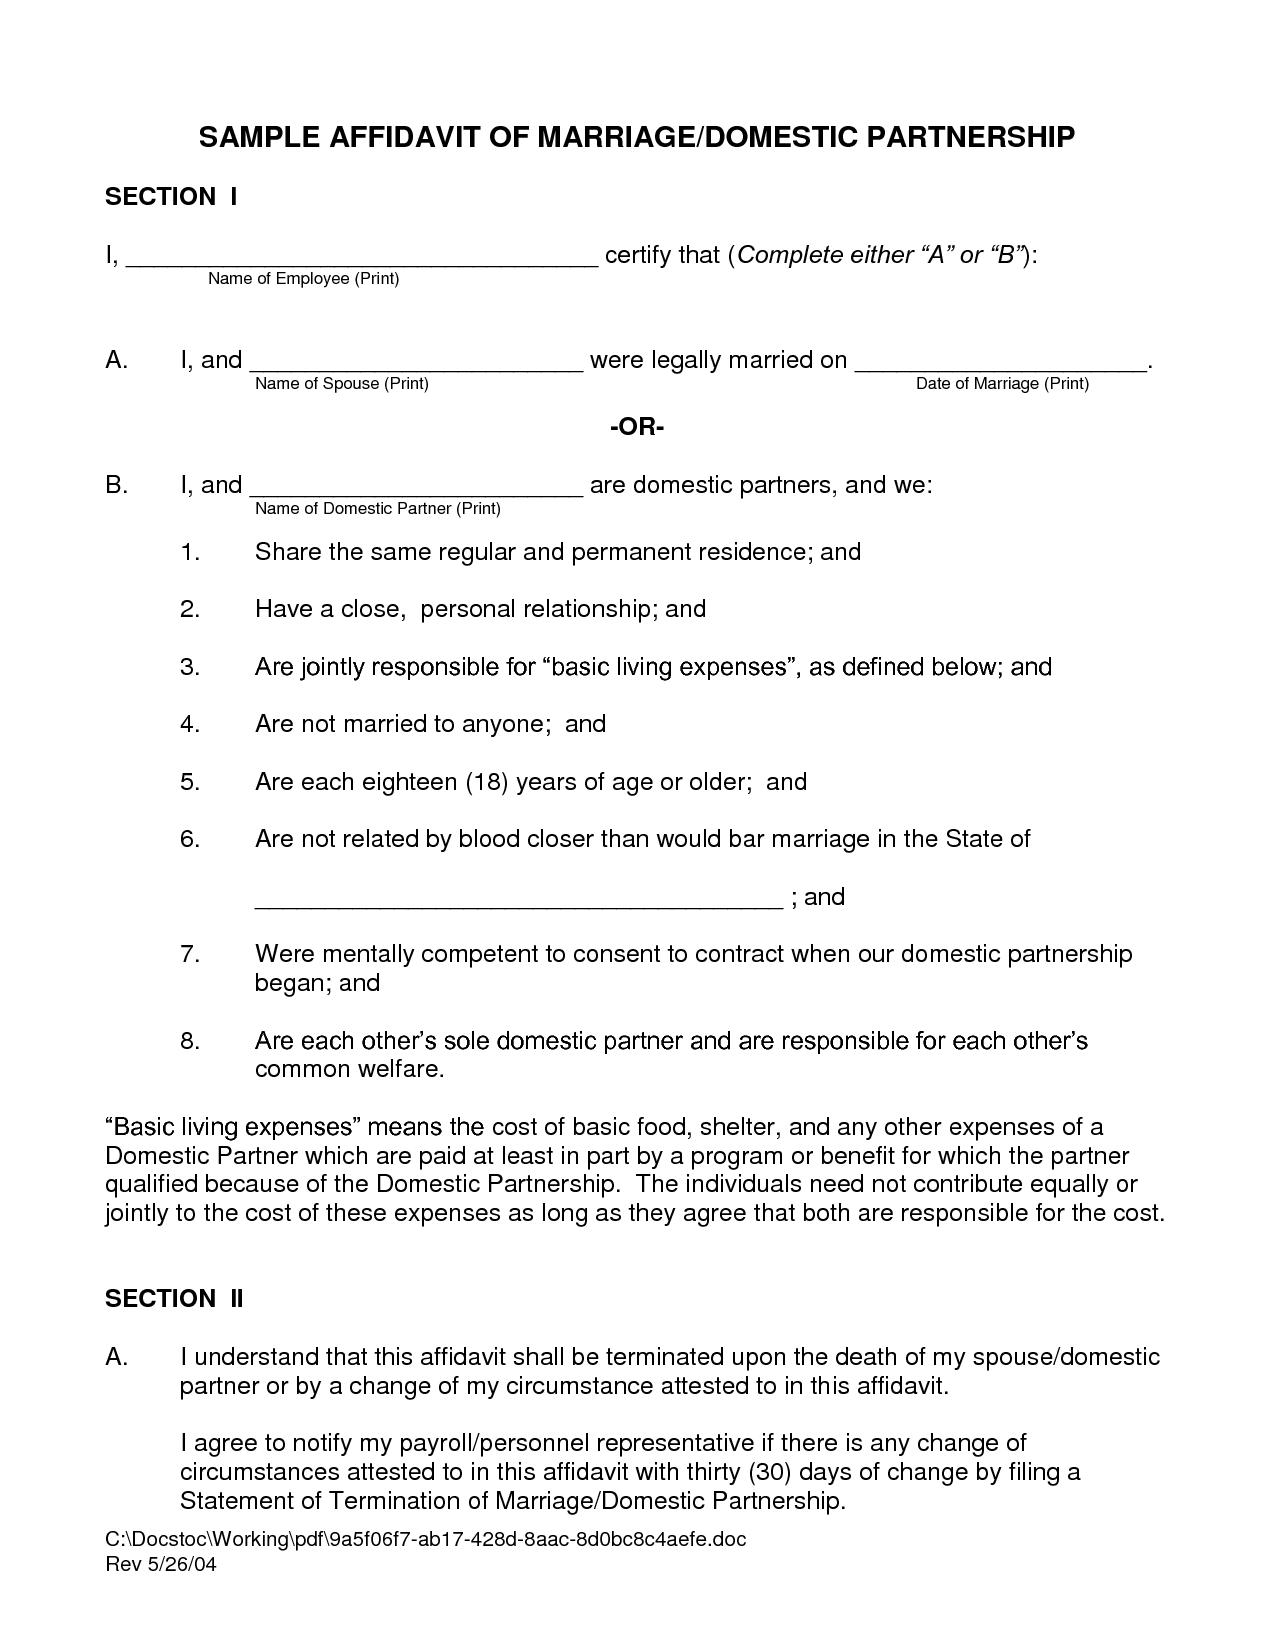 Sample Affidavit Marriage By Iol